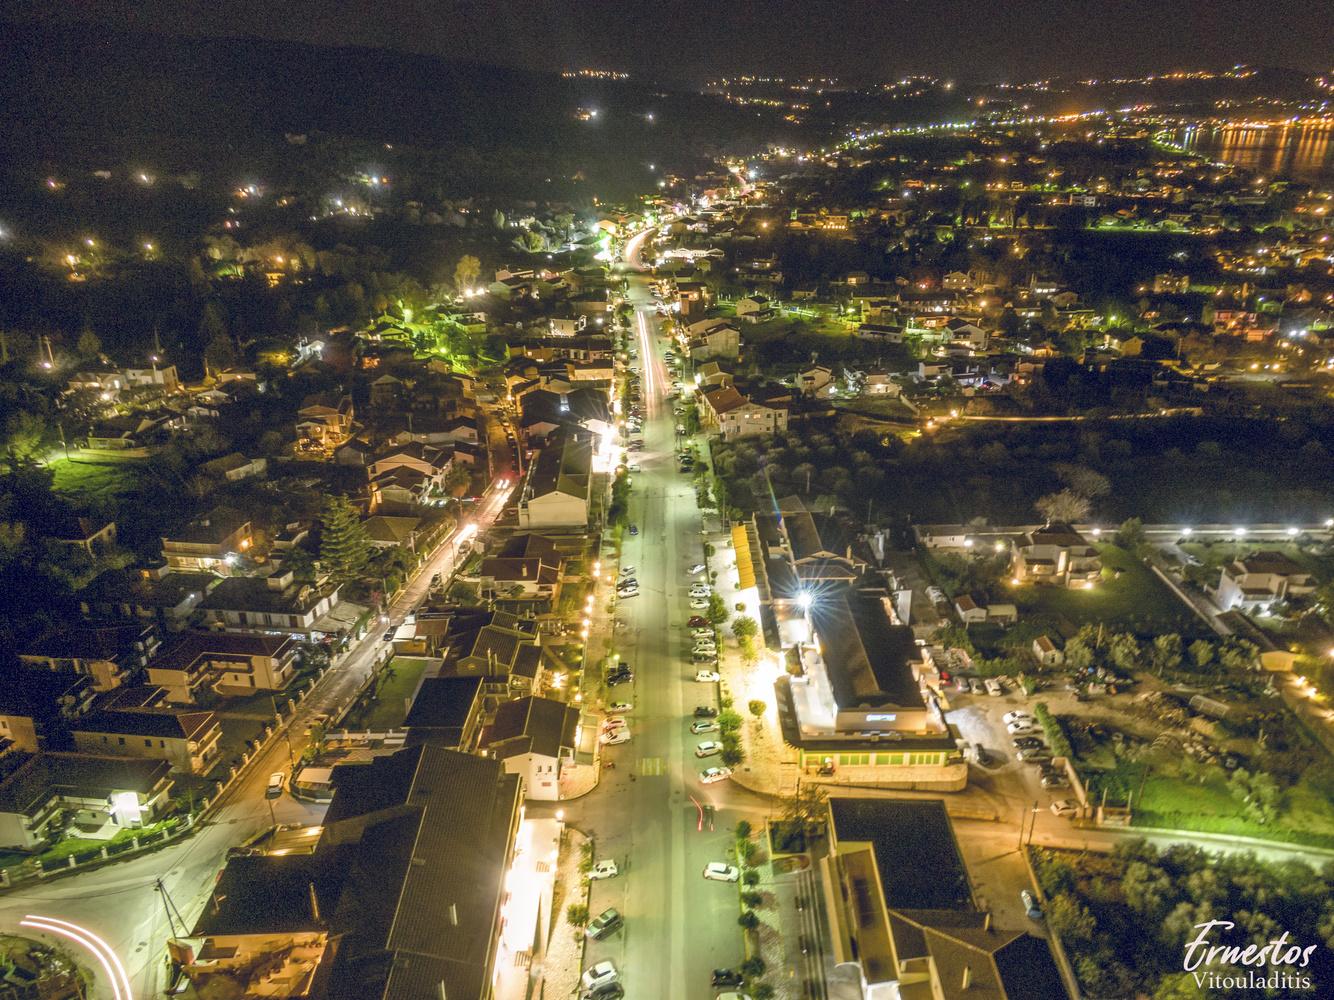 acharavi by night by ernestos vitouladitis